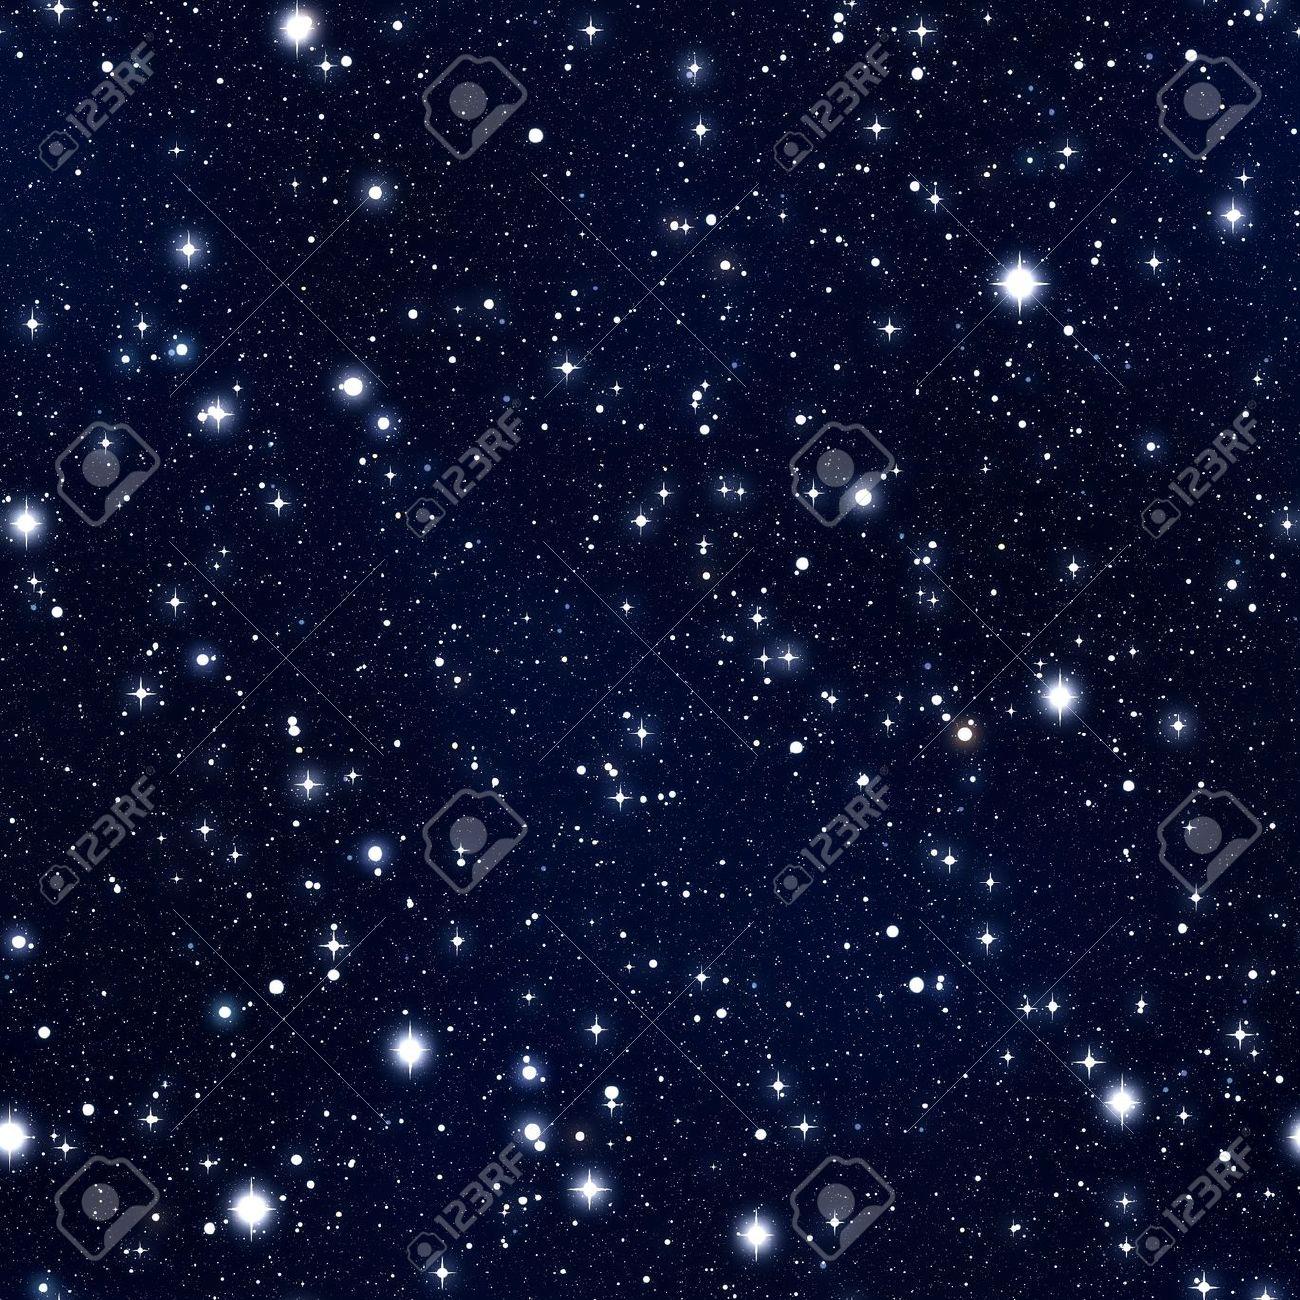 Night Sky Stars Texture The Night Sky With Stars